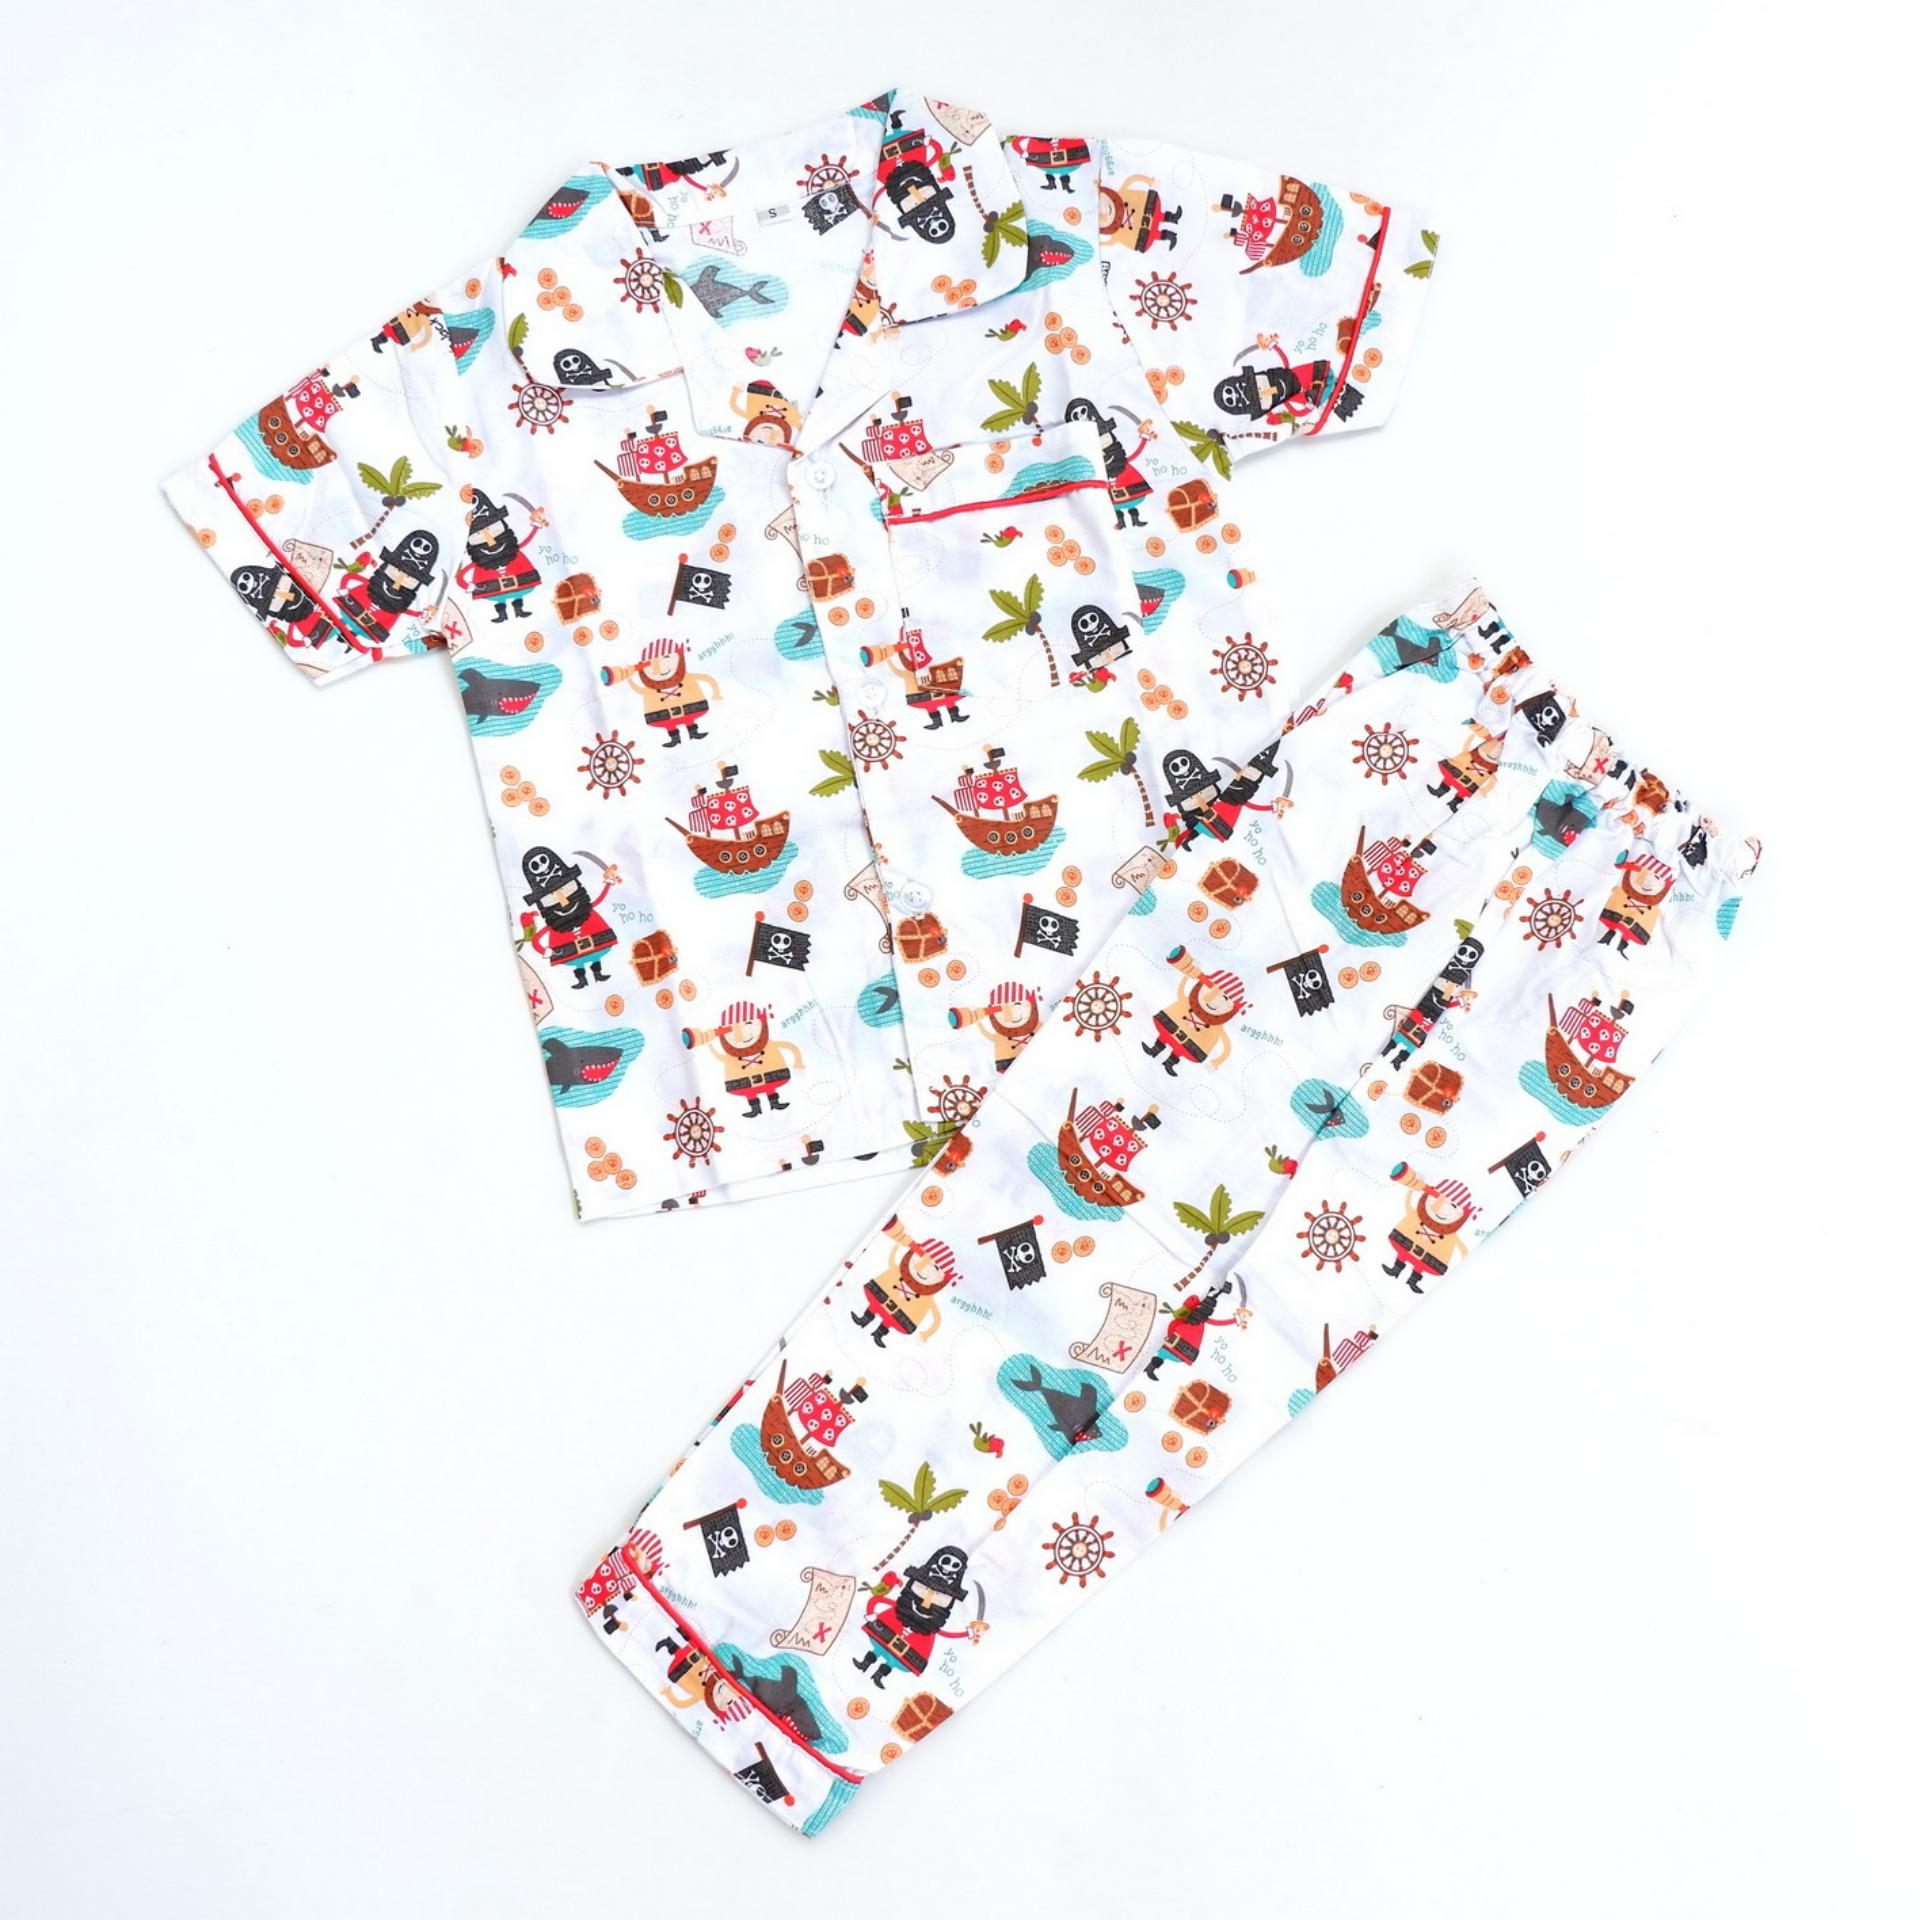 Sk 0028 Navyblue Daftar Harga Source Sleepwearkids piyama baju tidur anak pirates putih Lazada Indonesia Source